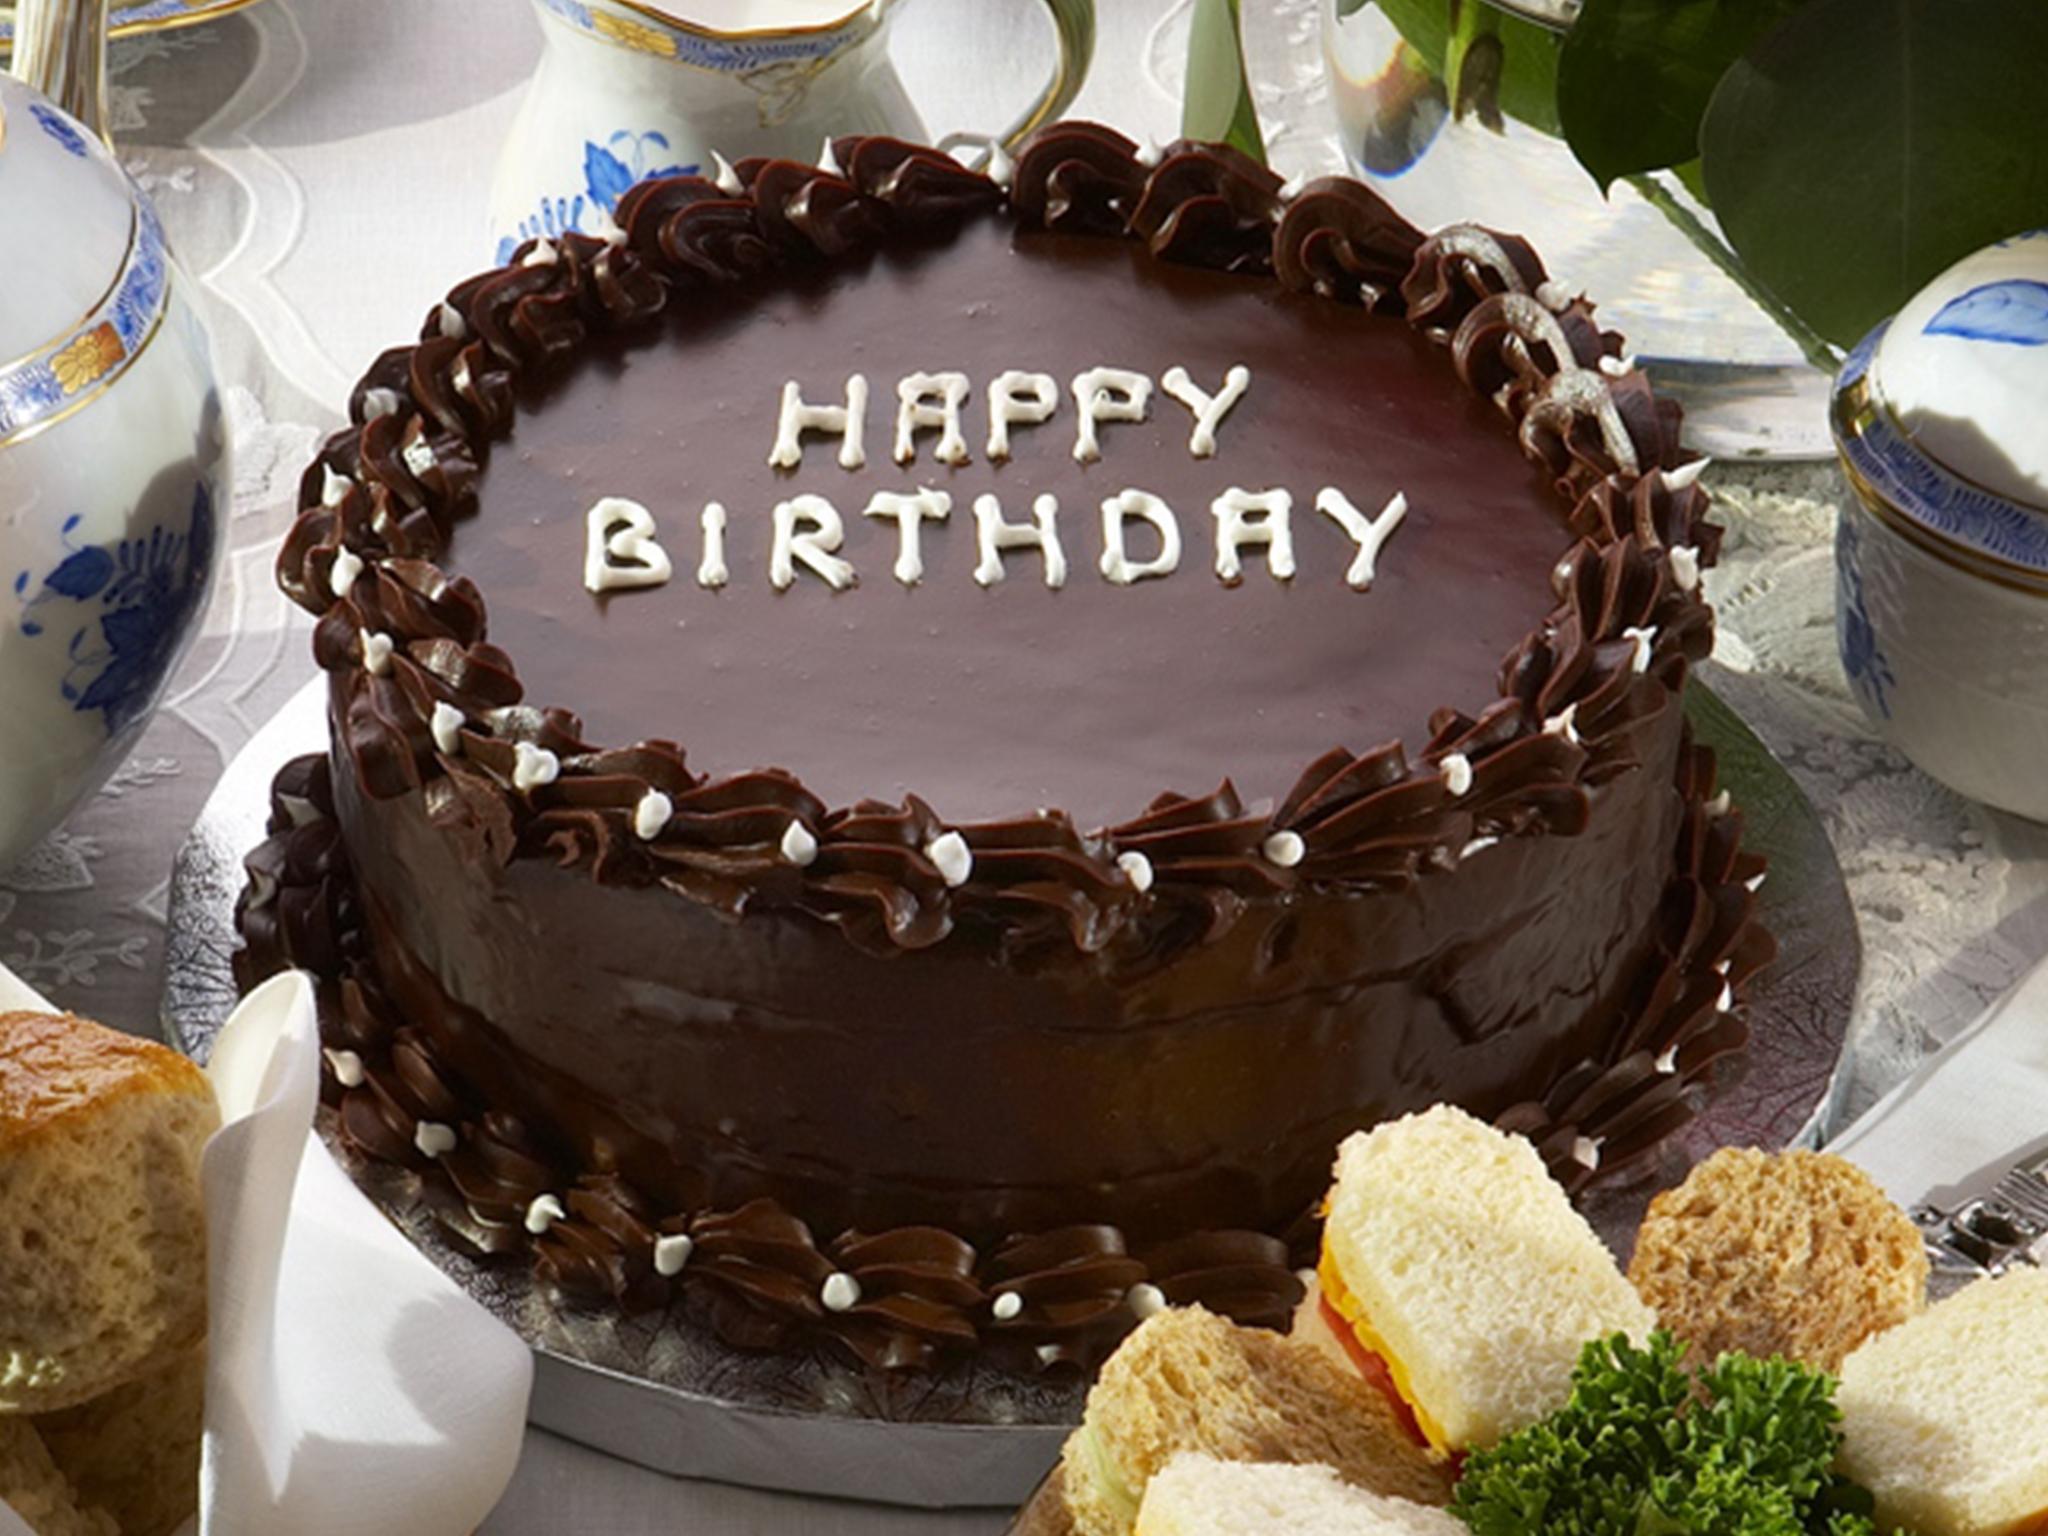 Queen Elizabeth IIs birthday chocolate cake recipe Food To Love